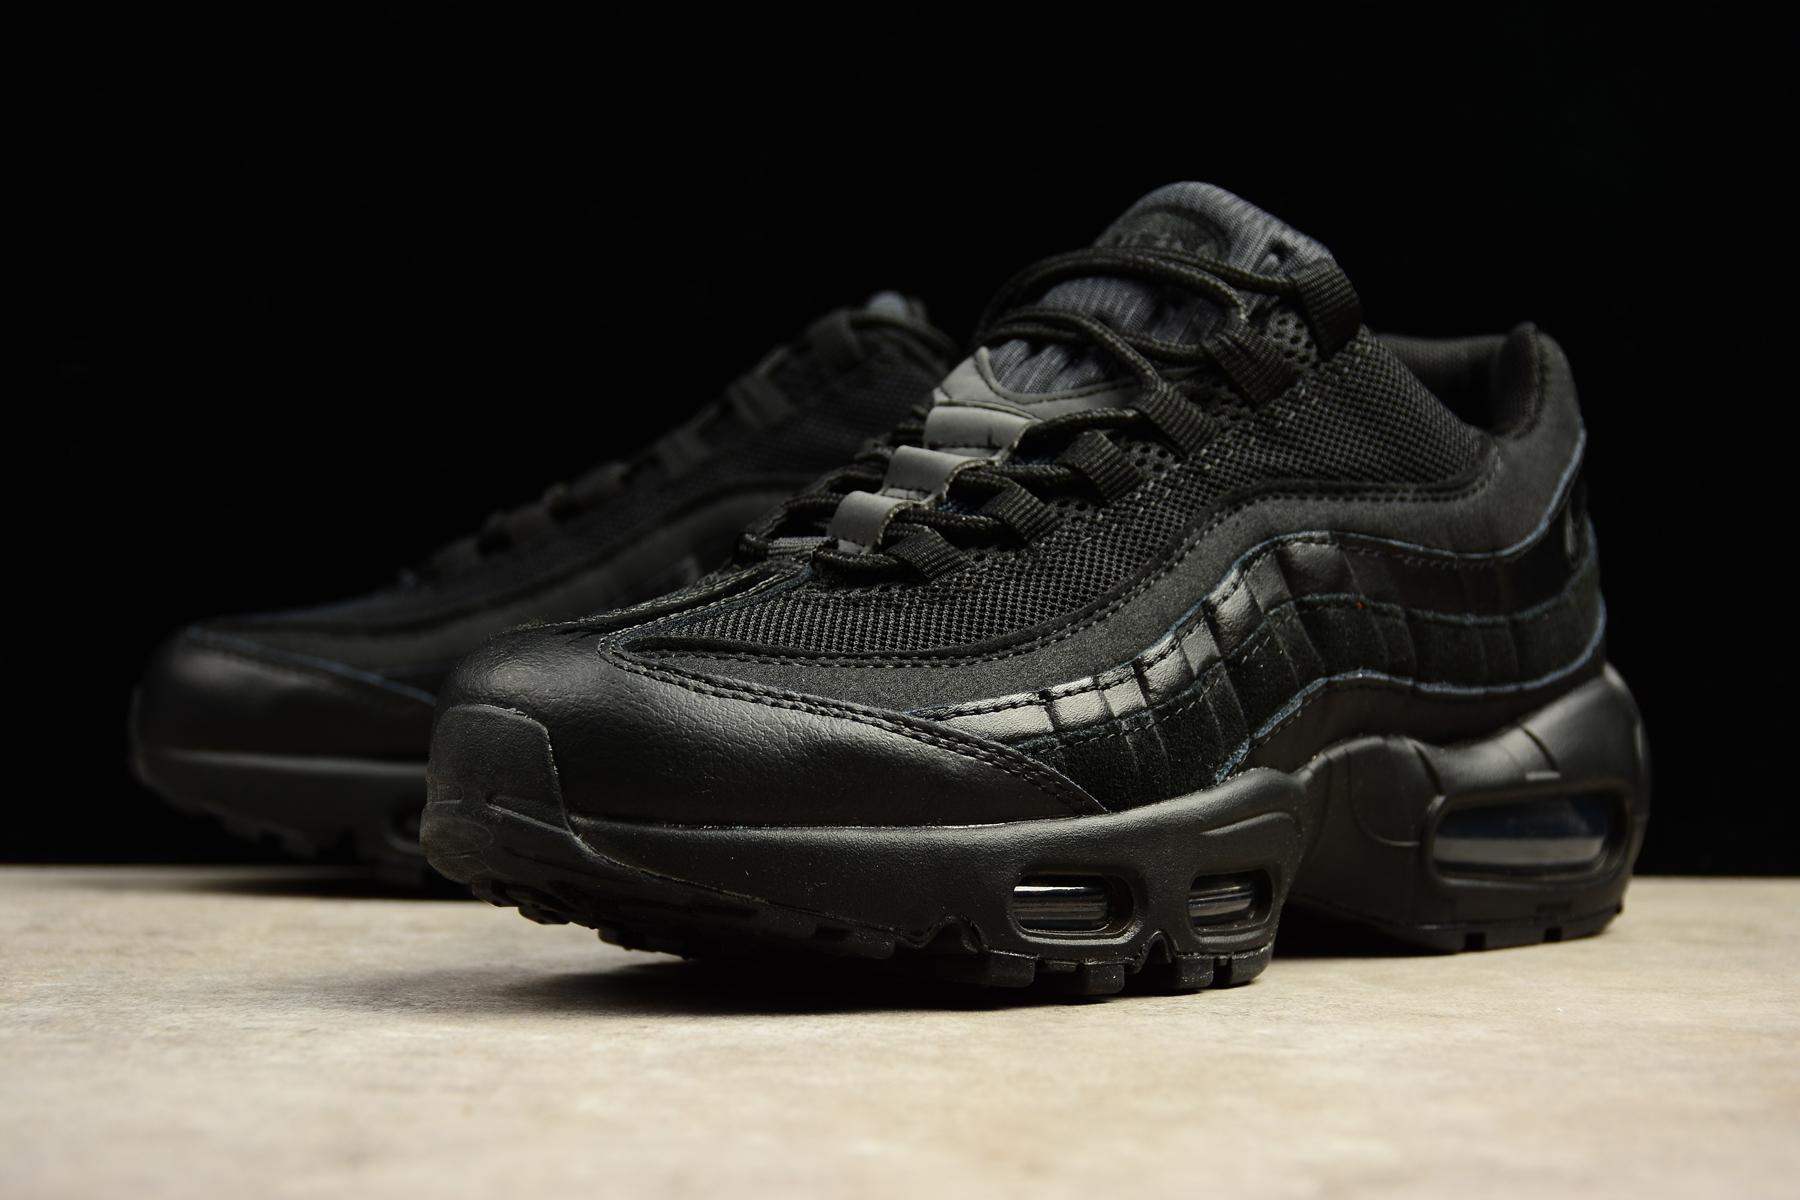 Nike Air Max 95 black black